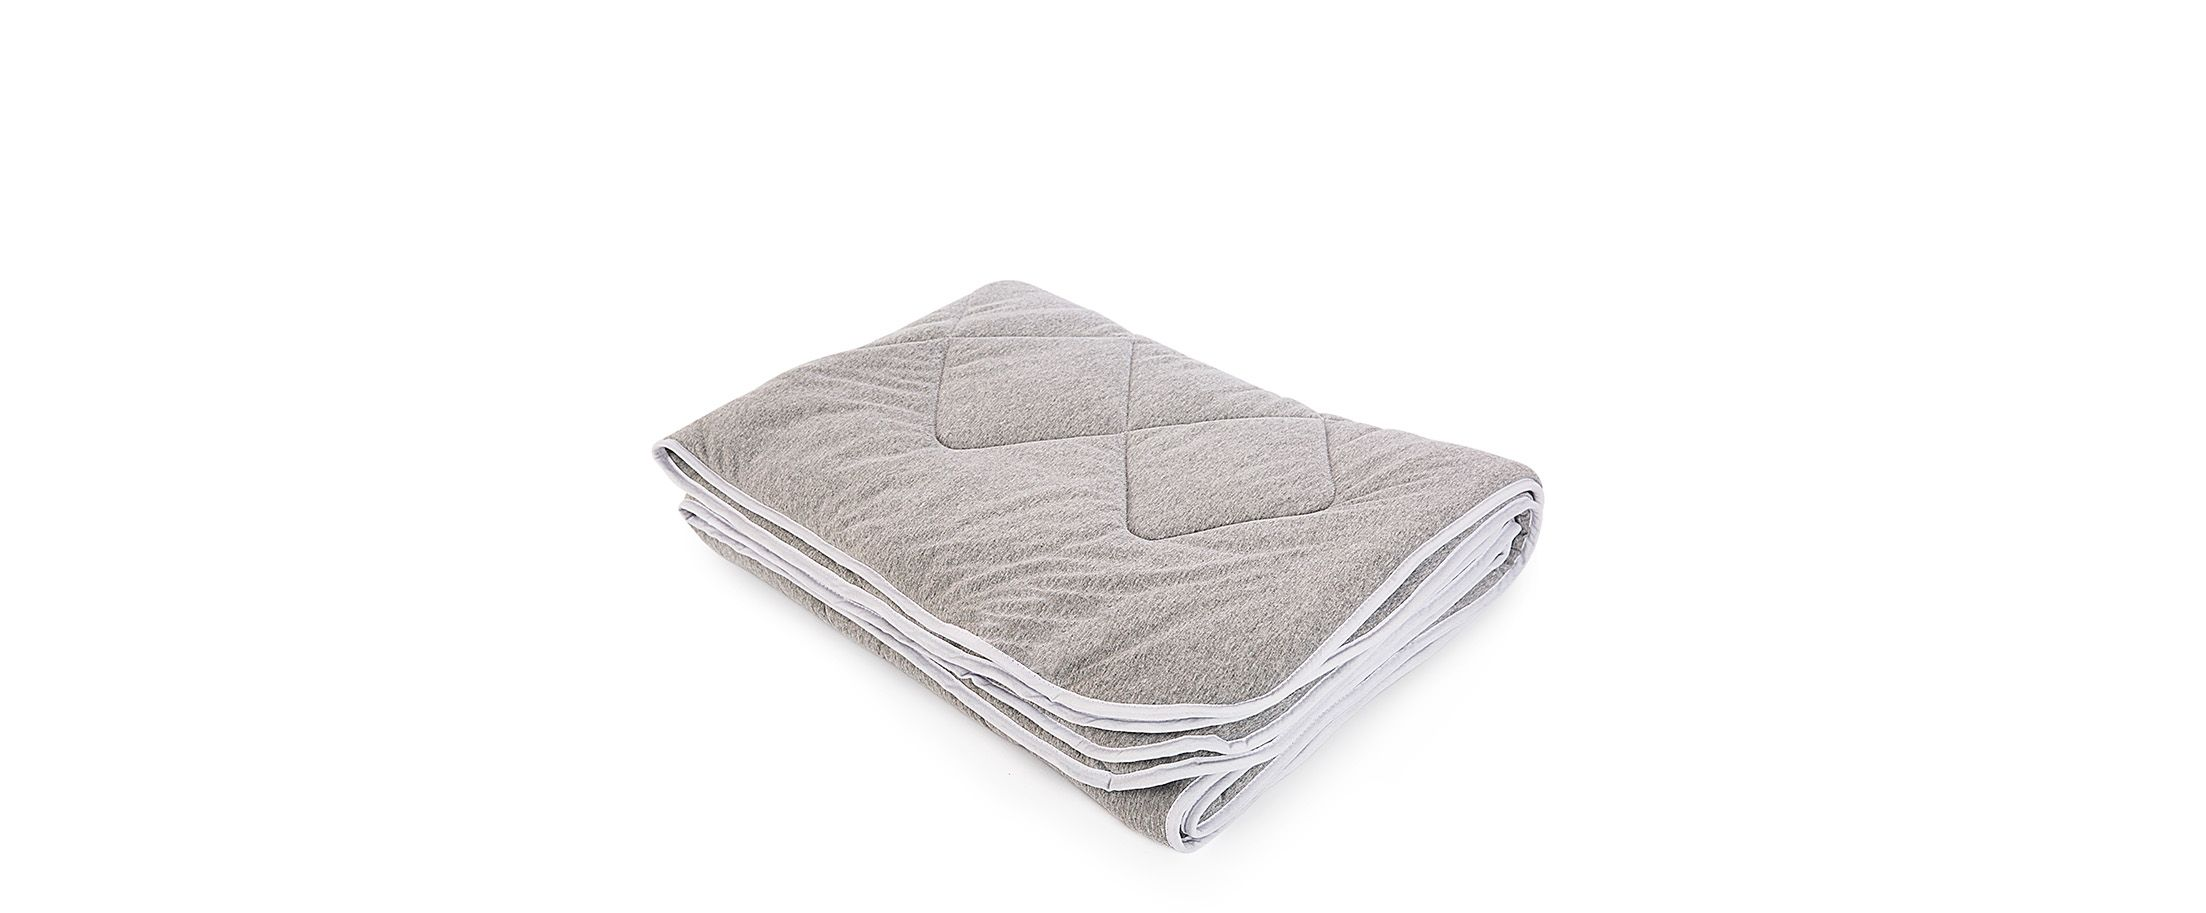 Одеяло трикотажное Бамбук серый меланж 140х205 Модель 4006 от MOON TRADE